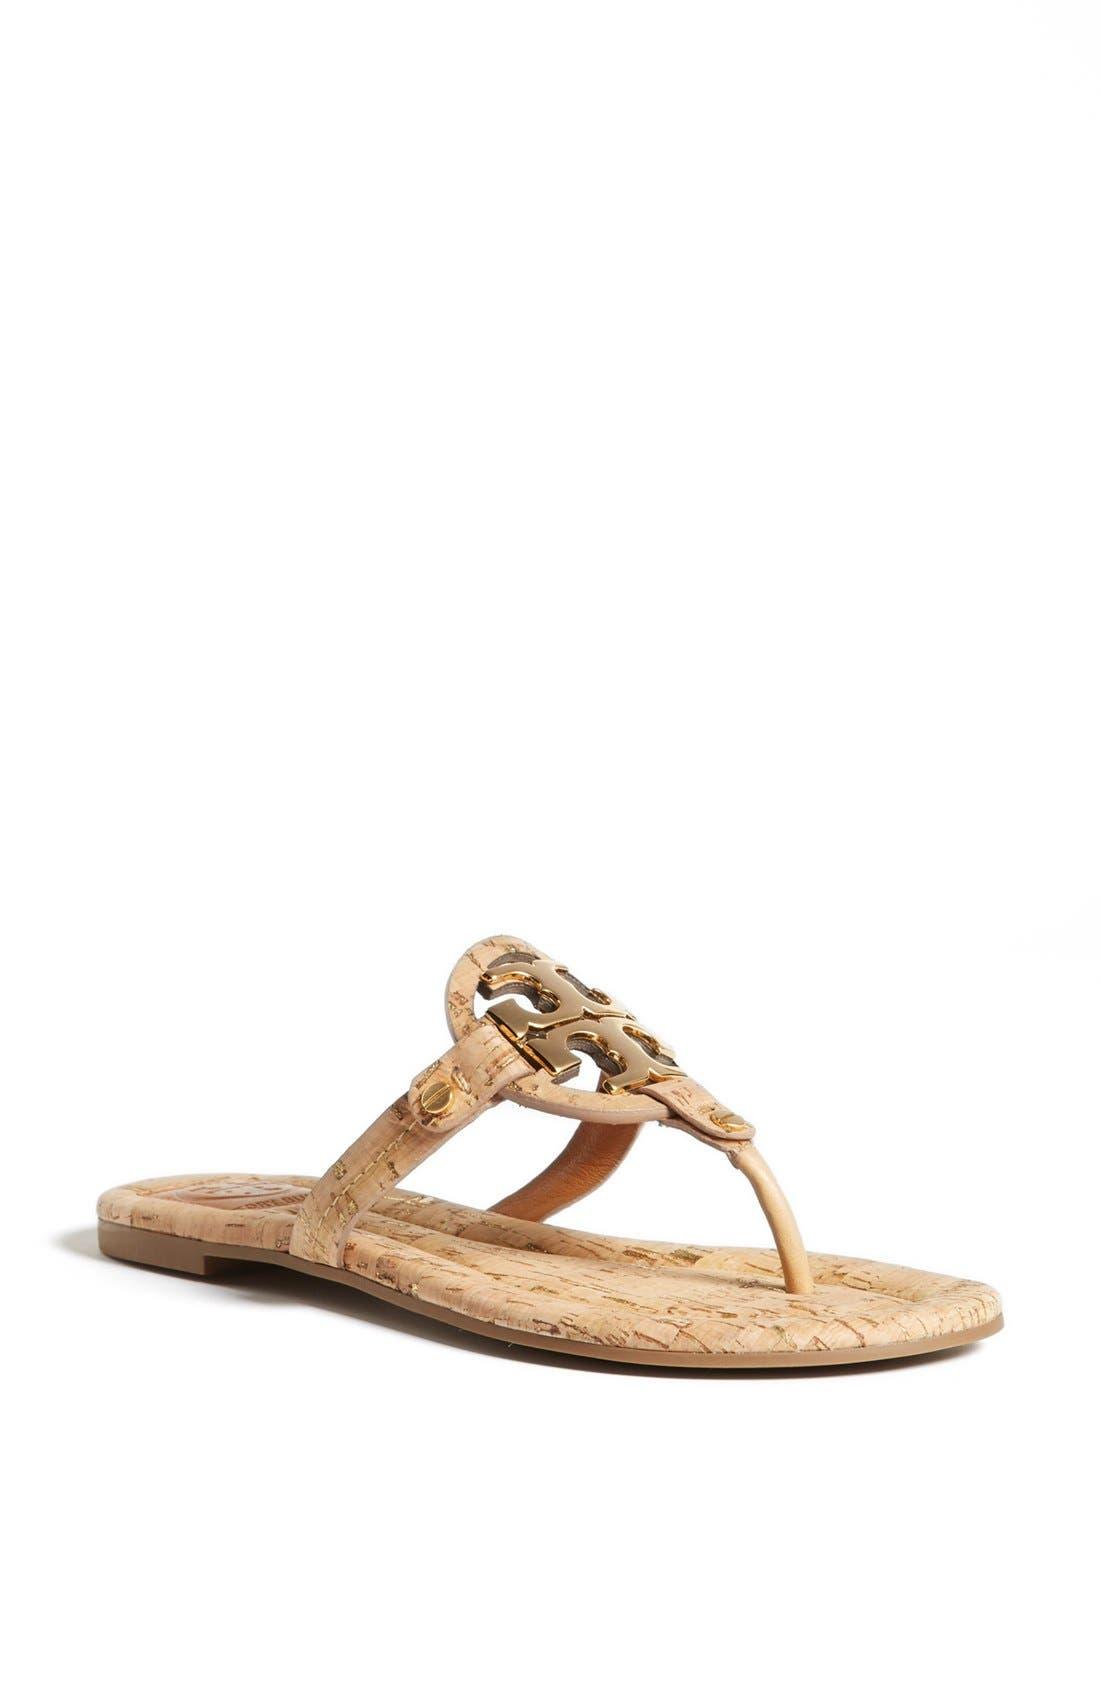 Main Image - Tory Burch 'Miller 2' Sandal